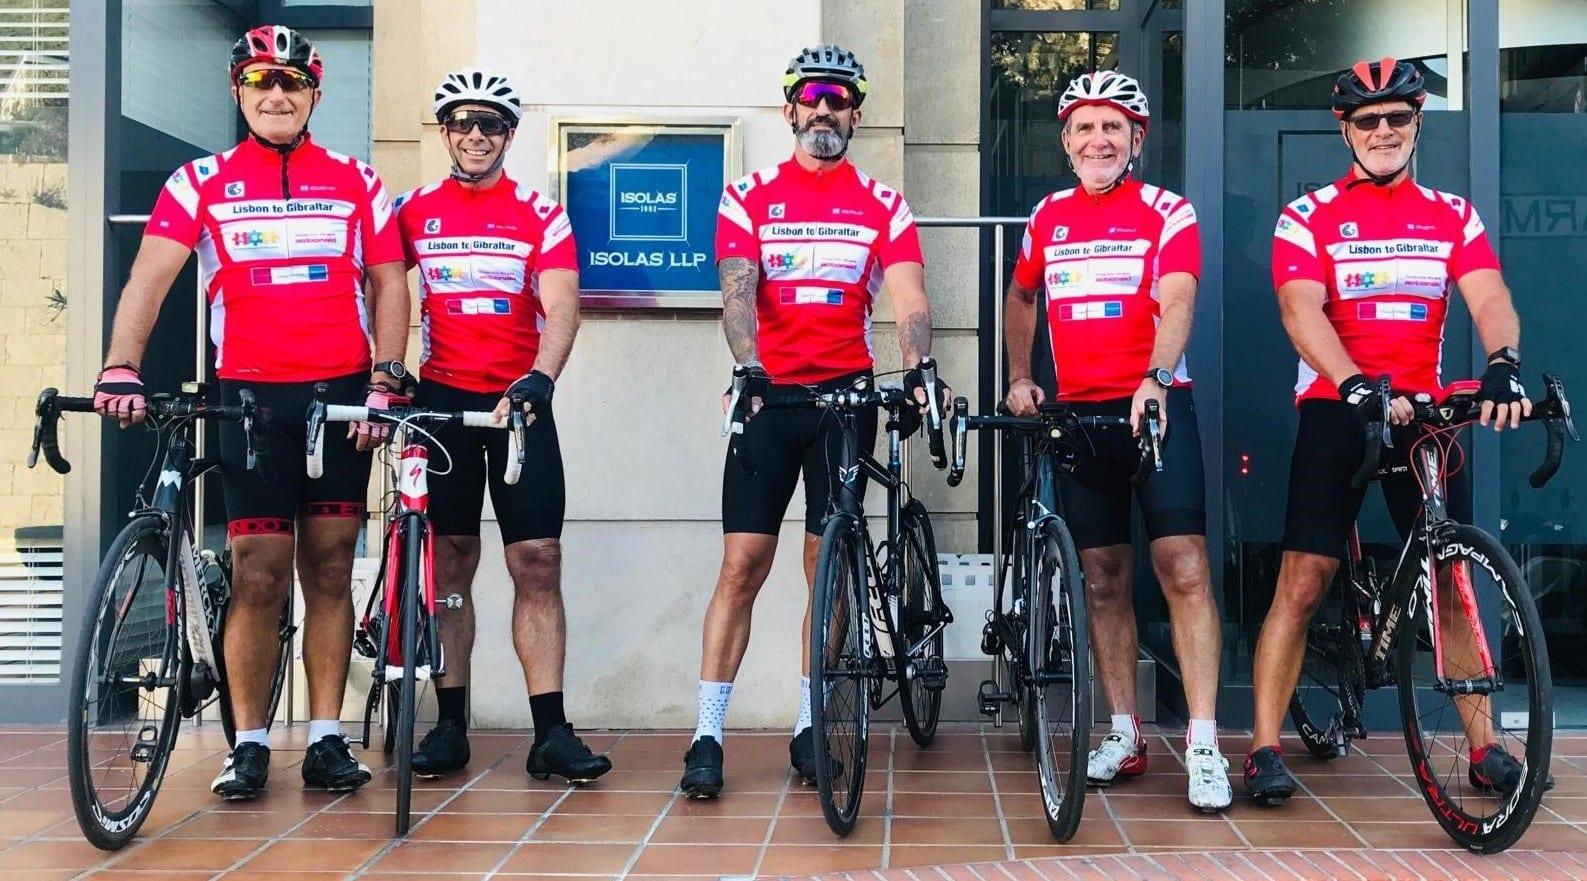 Cyclists Ian Howes, Jimmy Alcantara, Louis Hook, Michael Vella, and Jason Galton